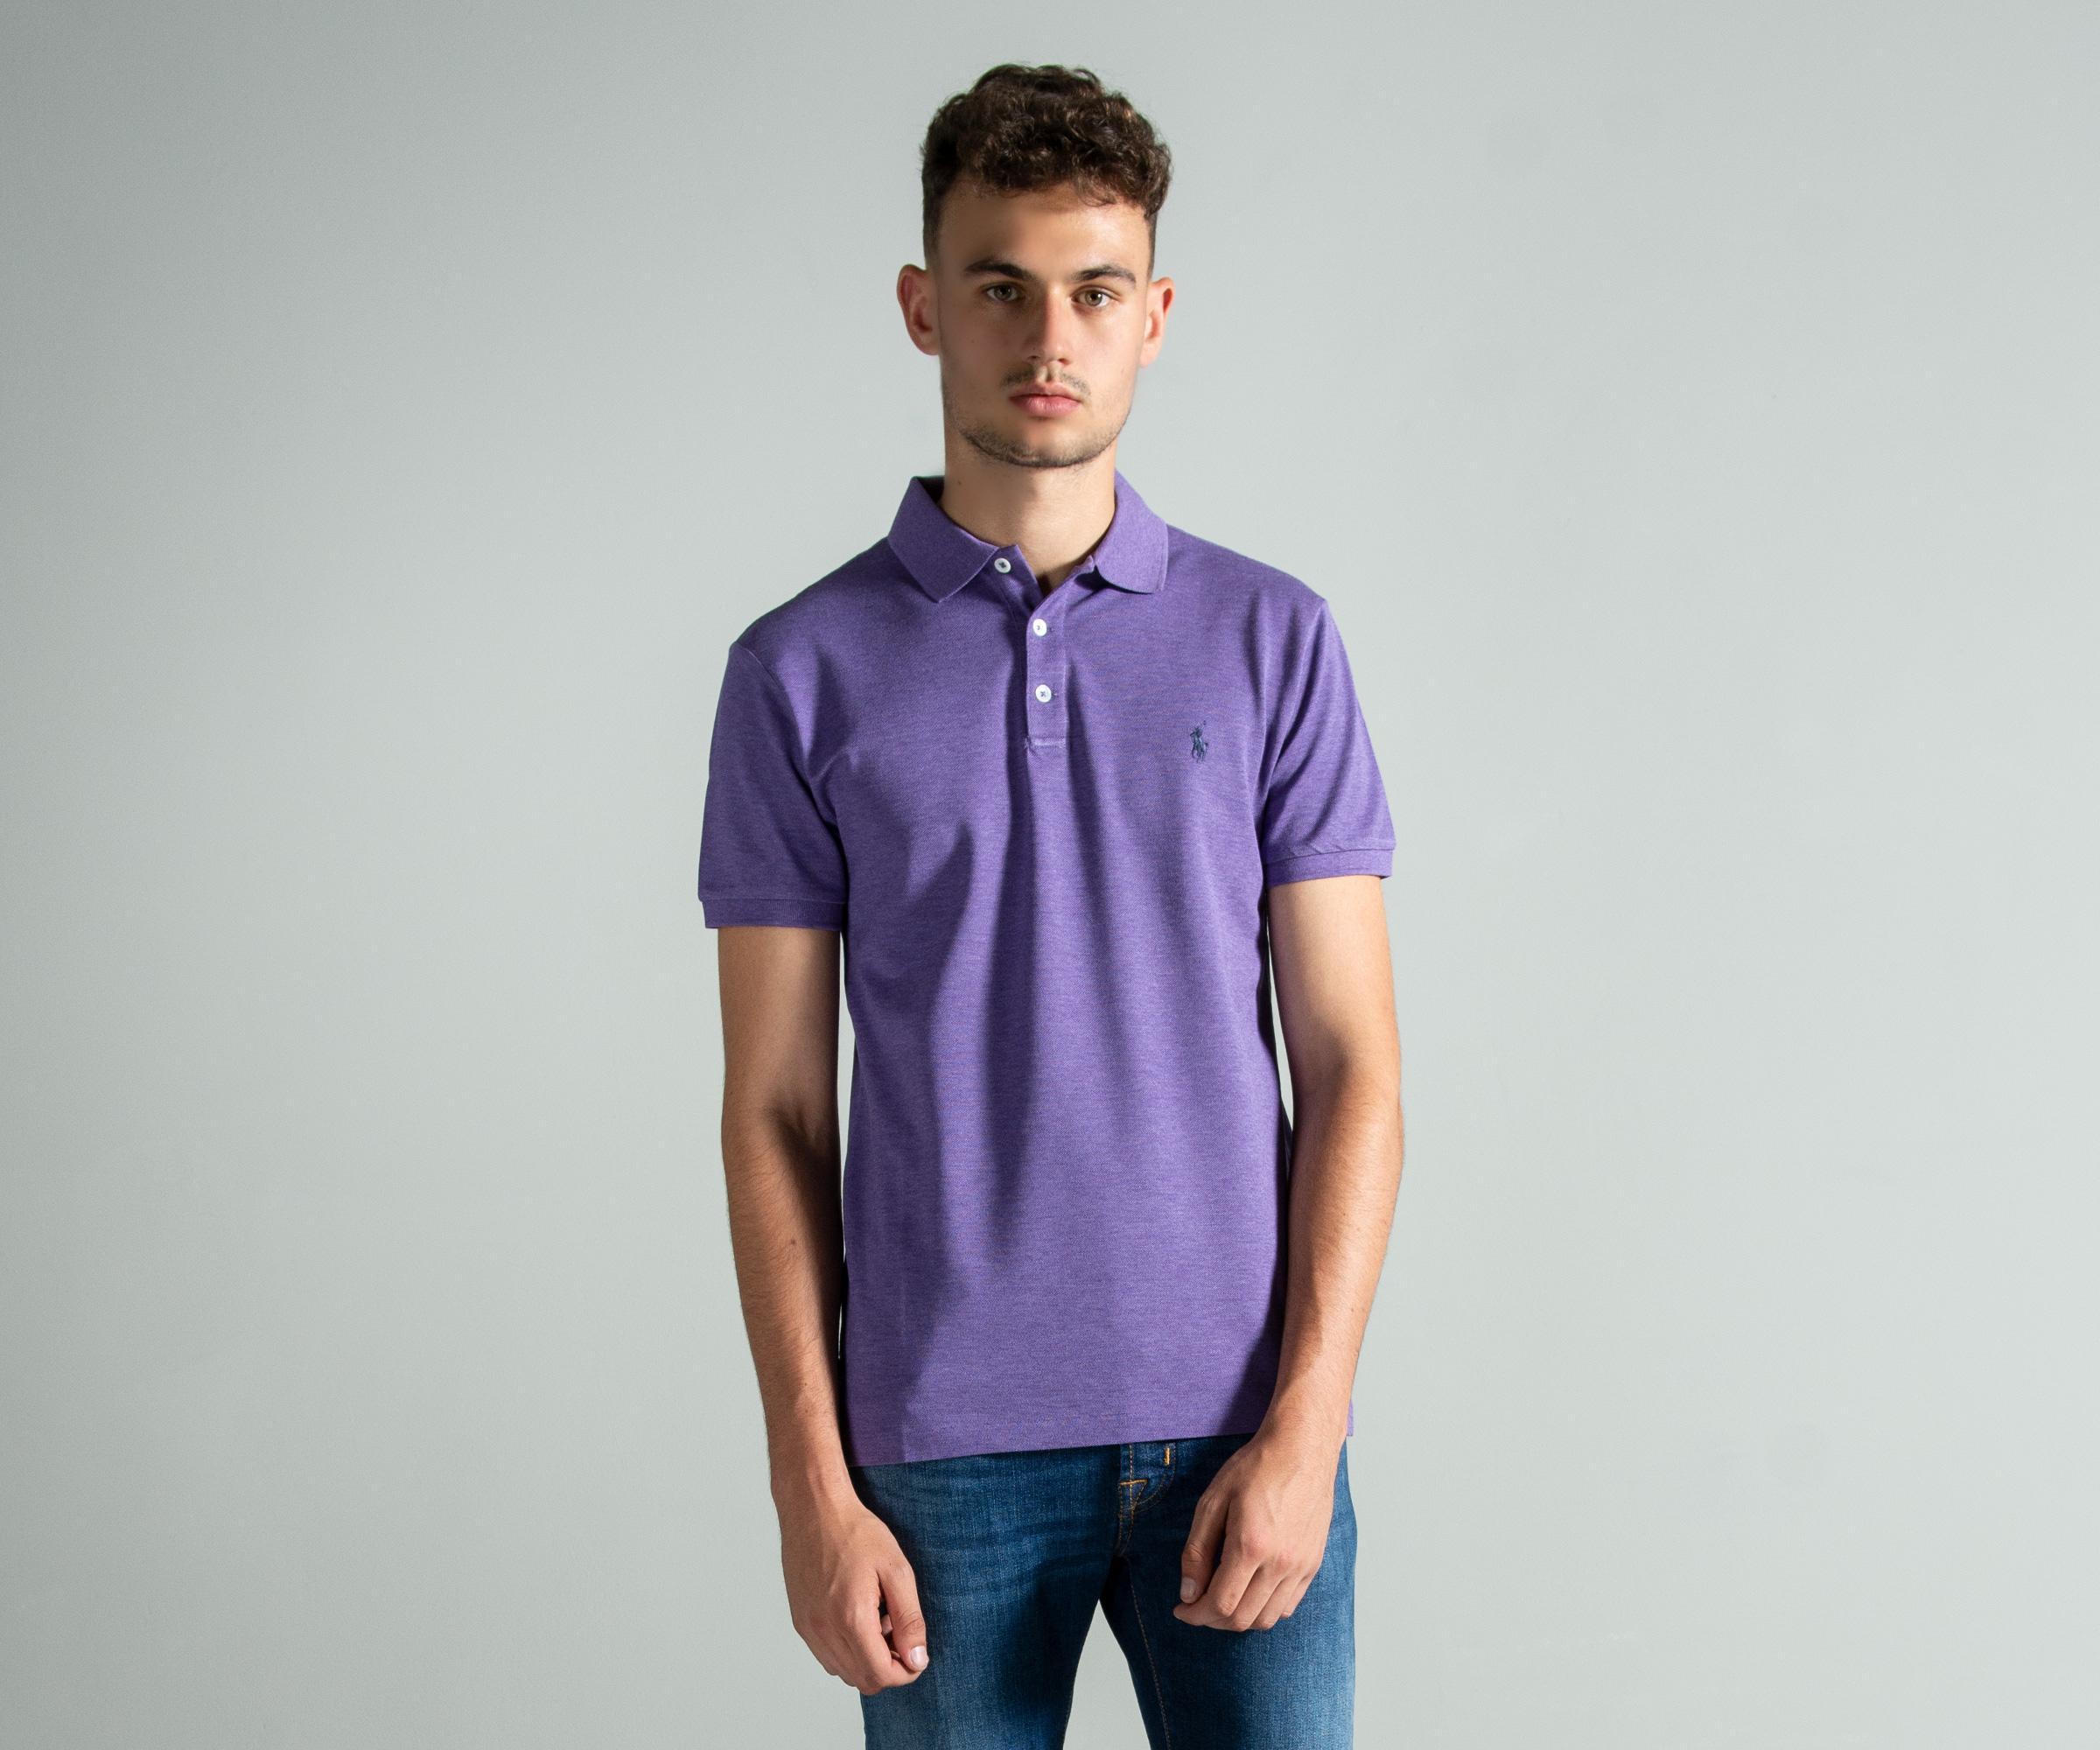 b669592ff Polo Ralph Lauren - Slim Fit Stretch Mesh Polo Purple for Men - Lyst. View  fullscreen